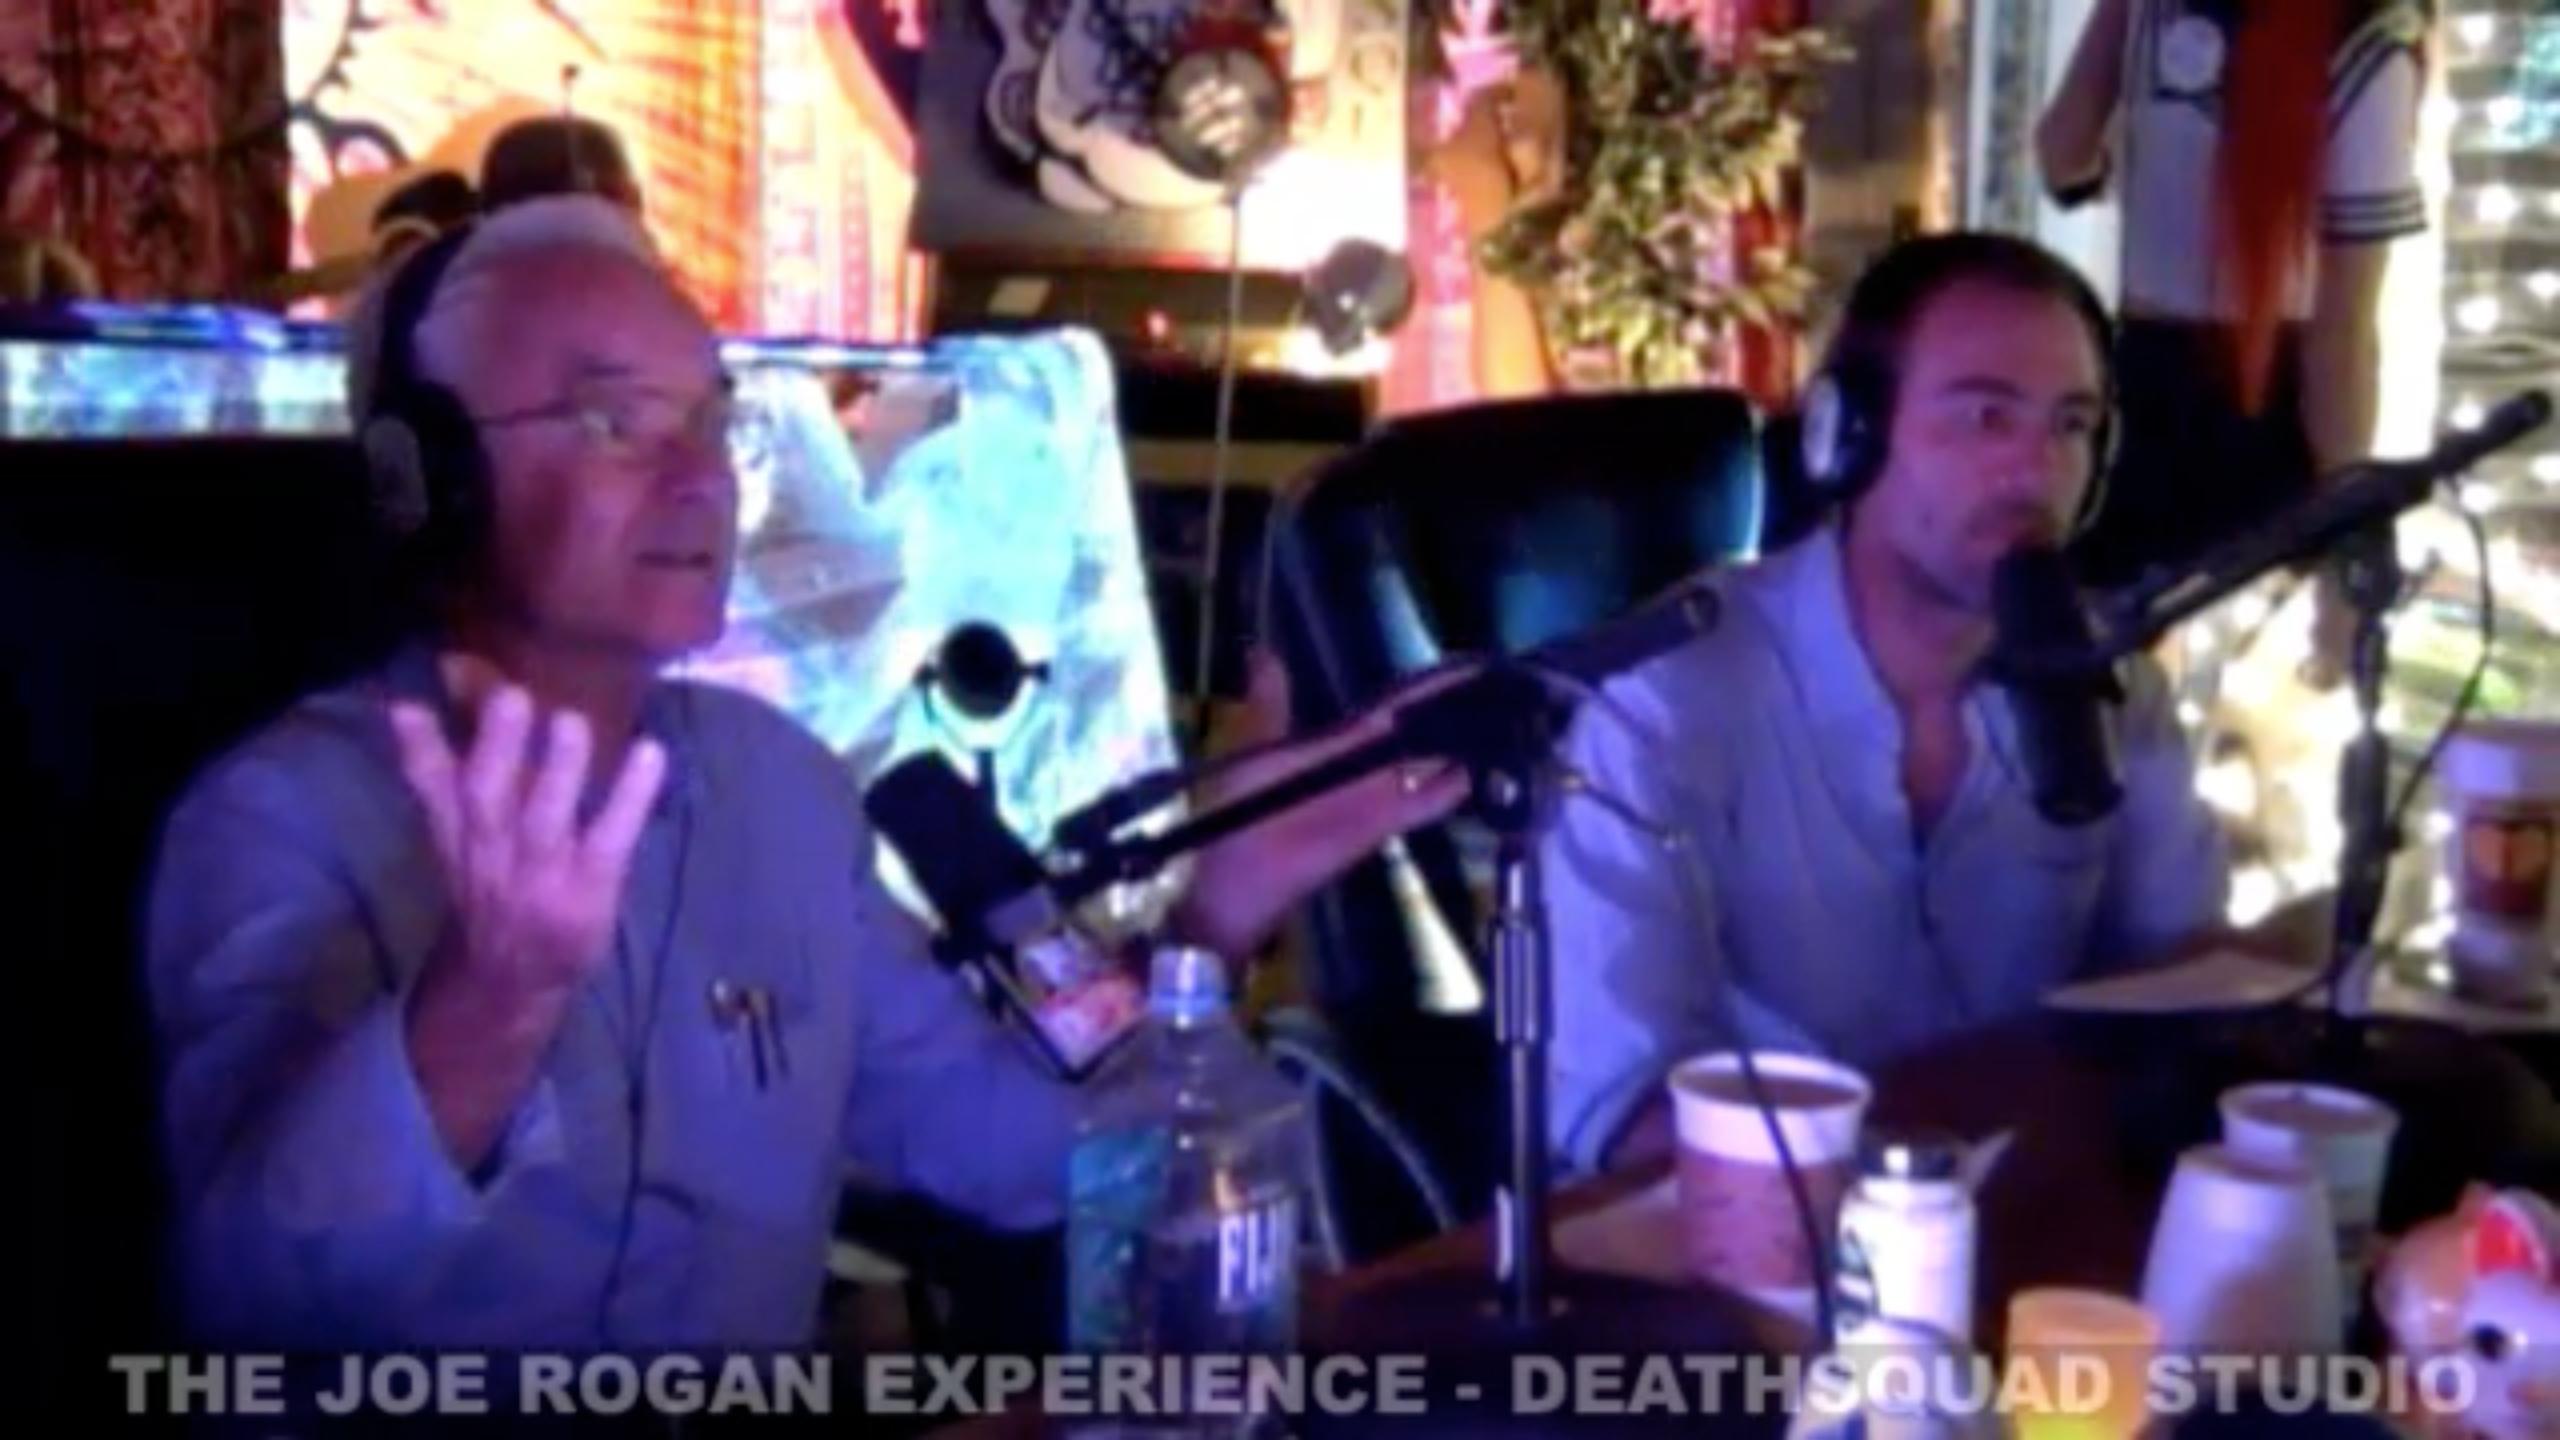 The Joe Rogan Experience #282 - Peter Duesberg, Bryan Callen, Brian Redban